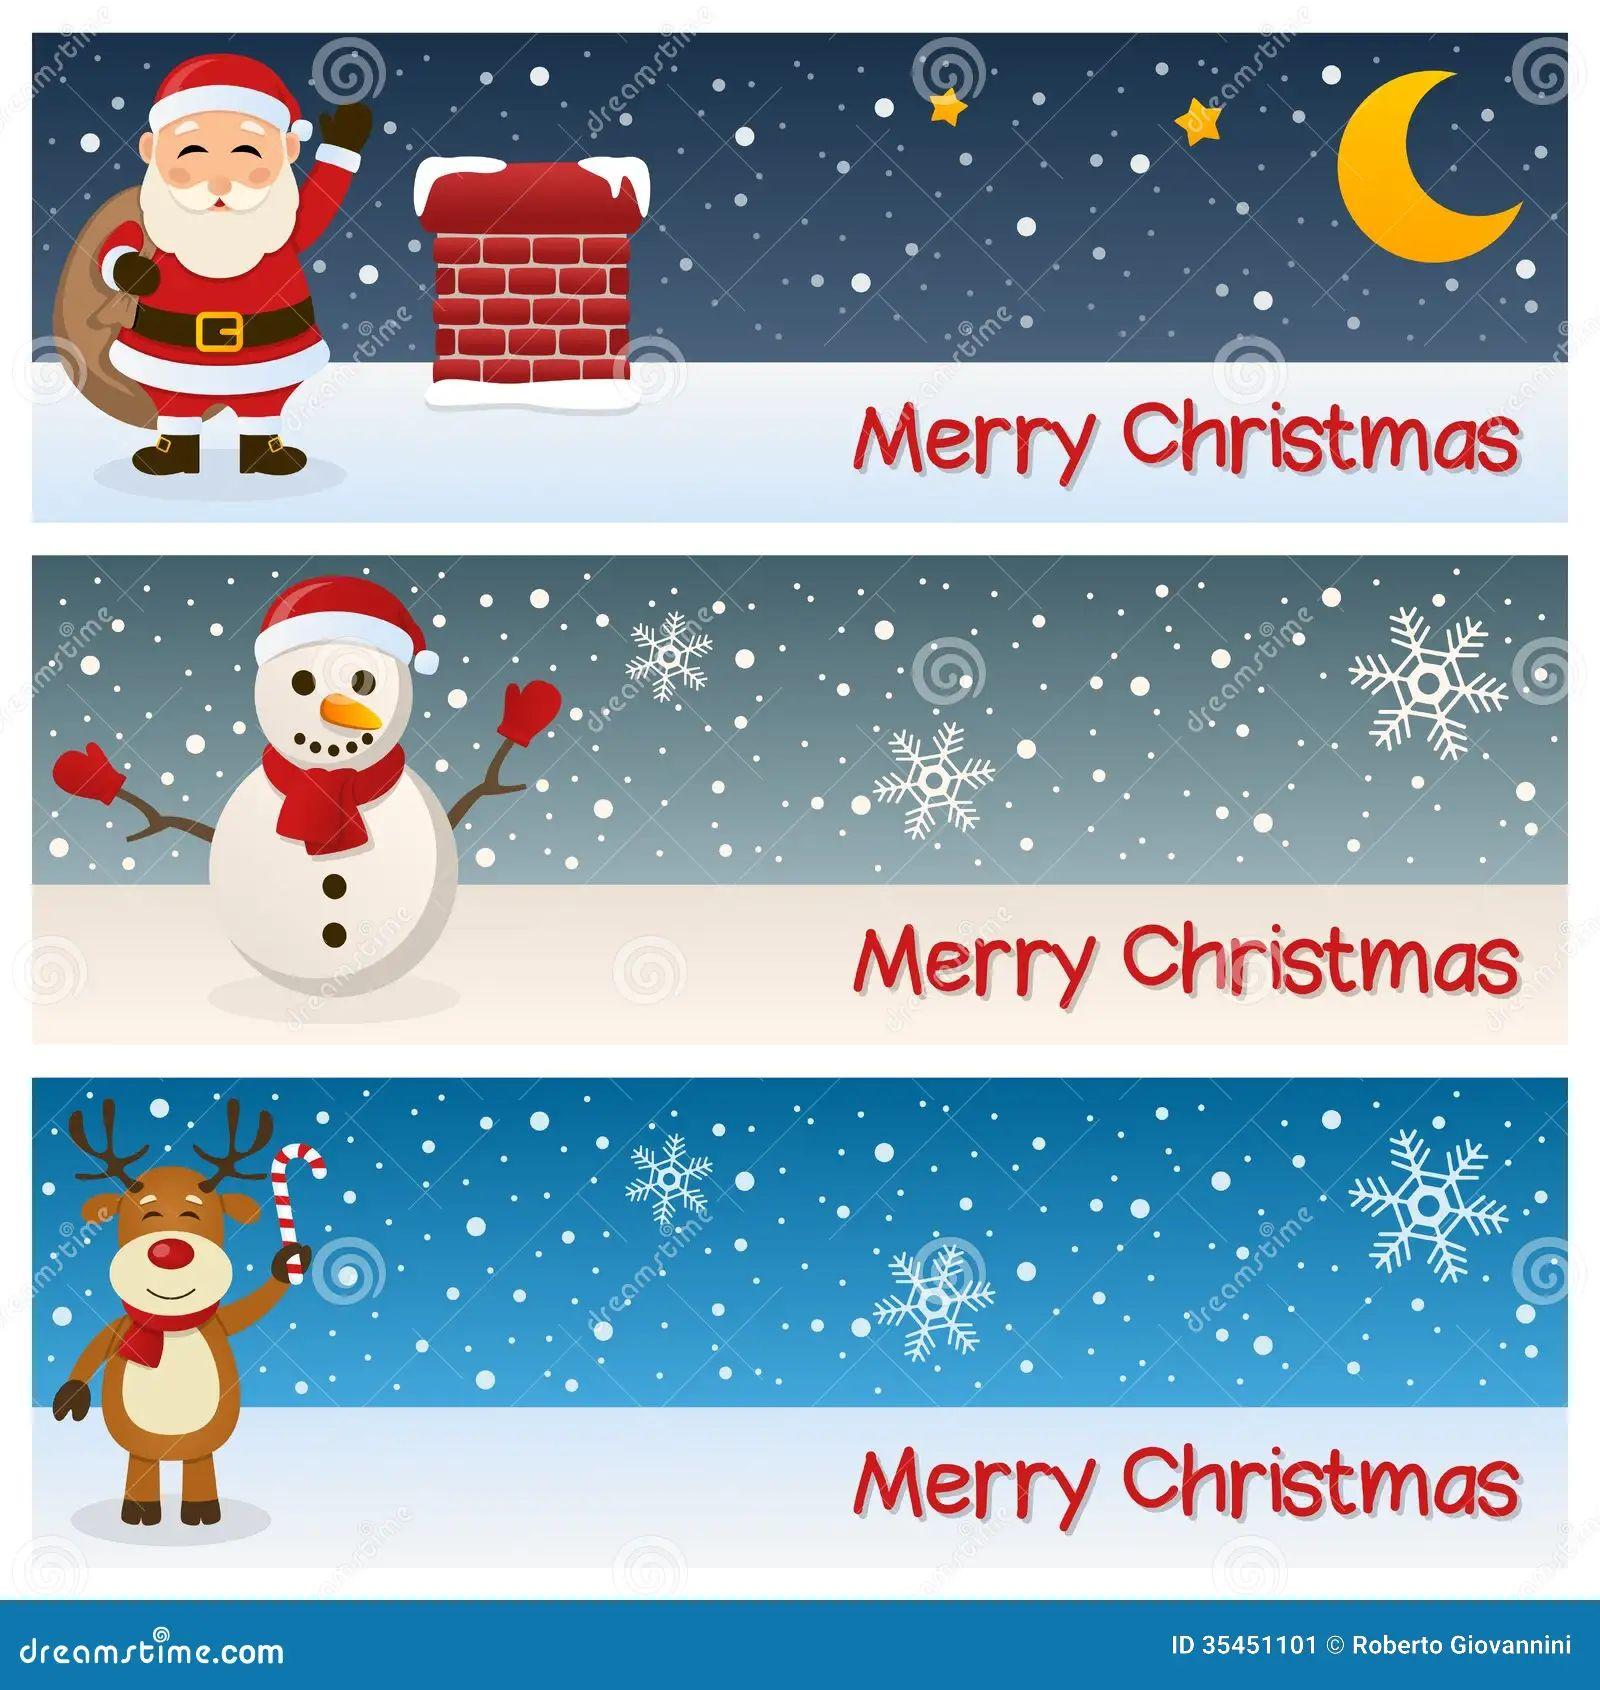 merry christmas banners